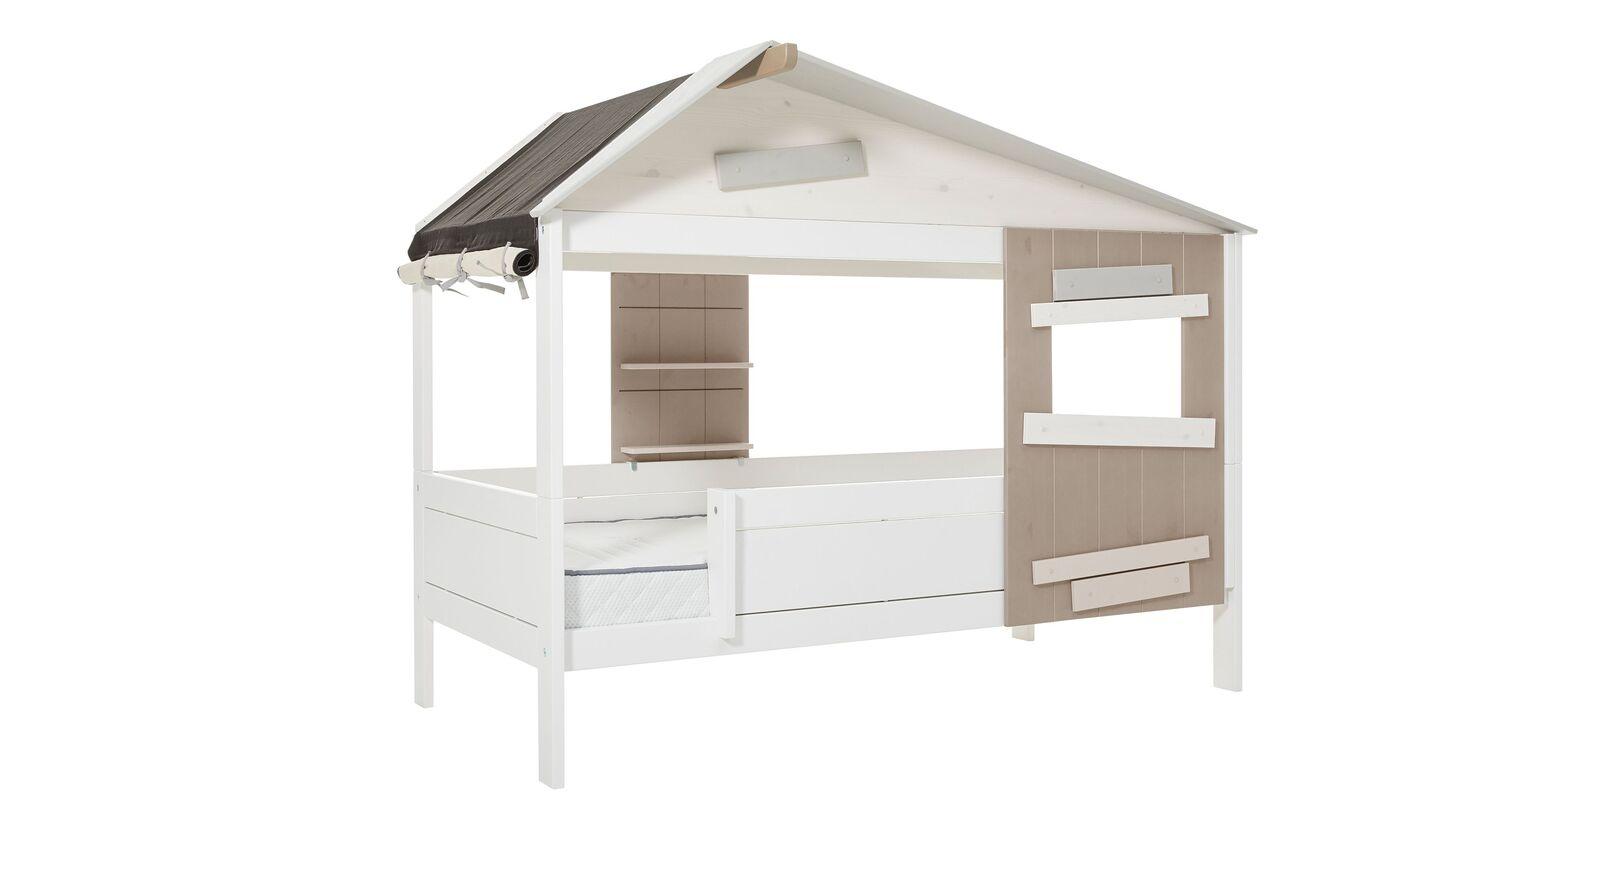 LIFETIME Hüttenbett Hideout in Weiß lackiert